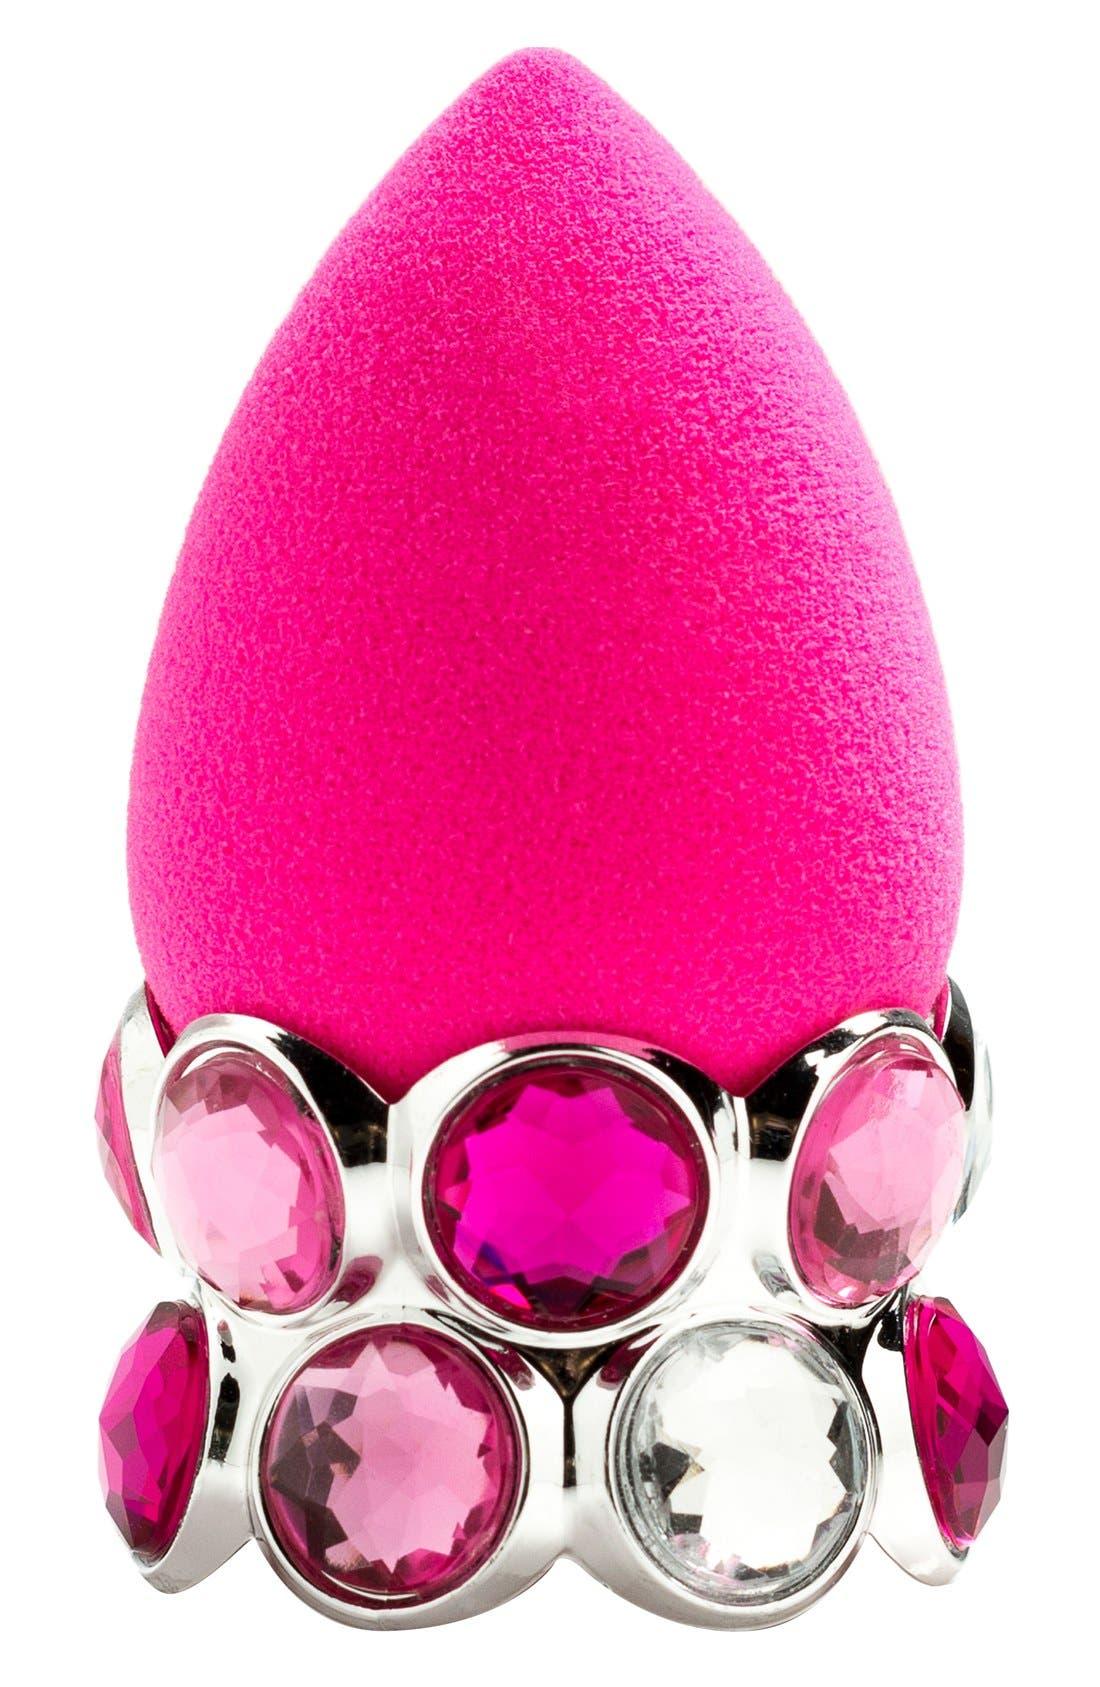 BEAUTYBLENDER<SUP>®</SUP> 'bling.ring' Original Makeup Sponge Applicator Kit, Main, color, 000